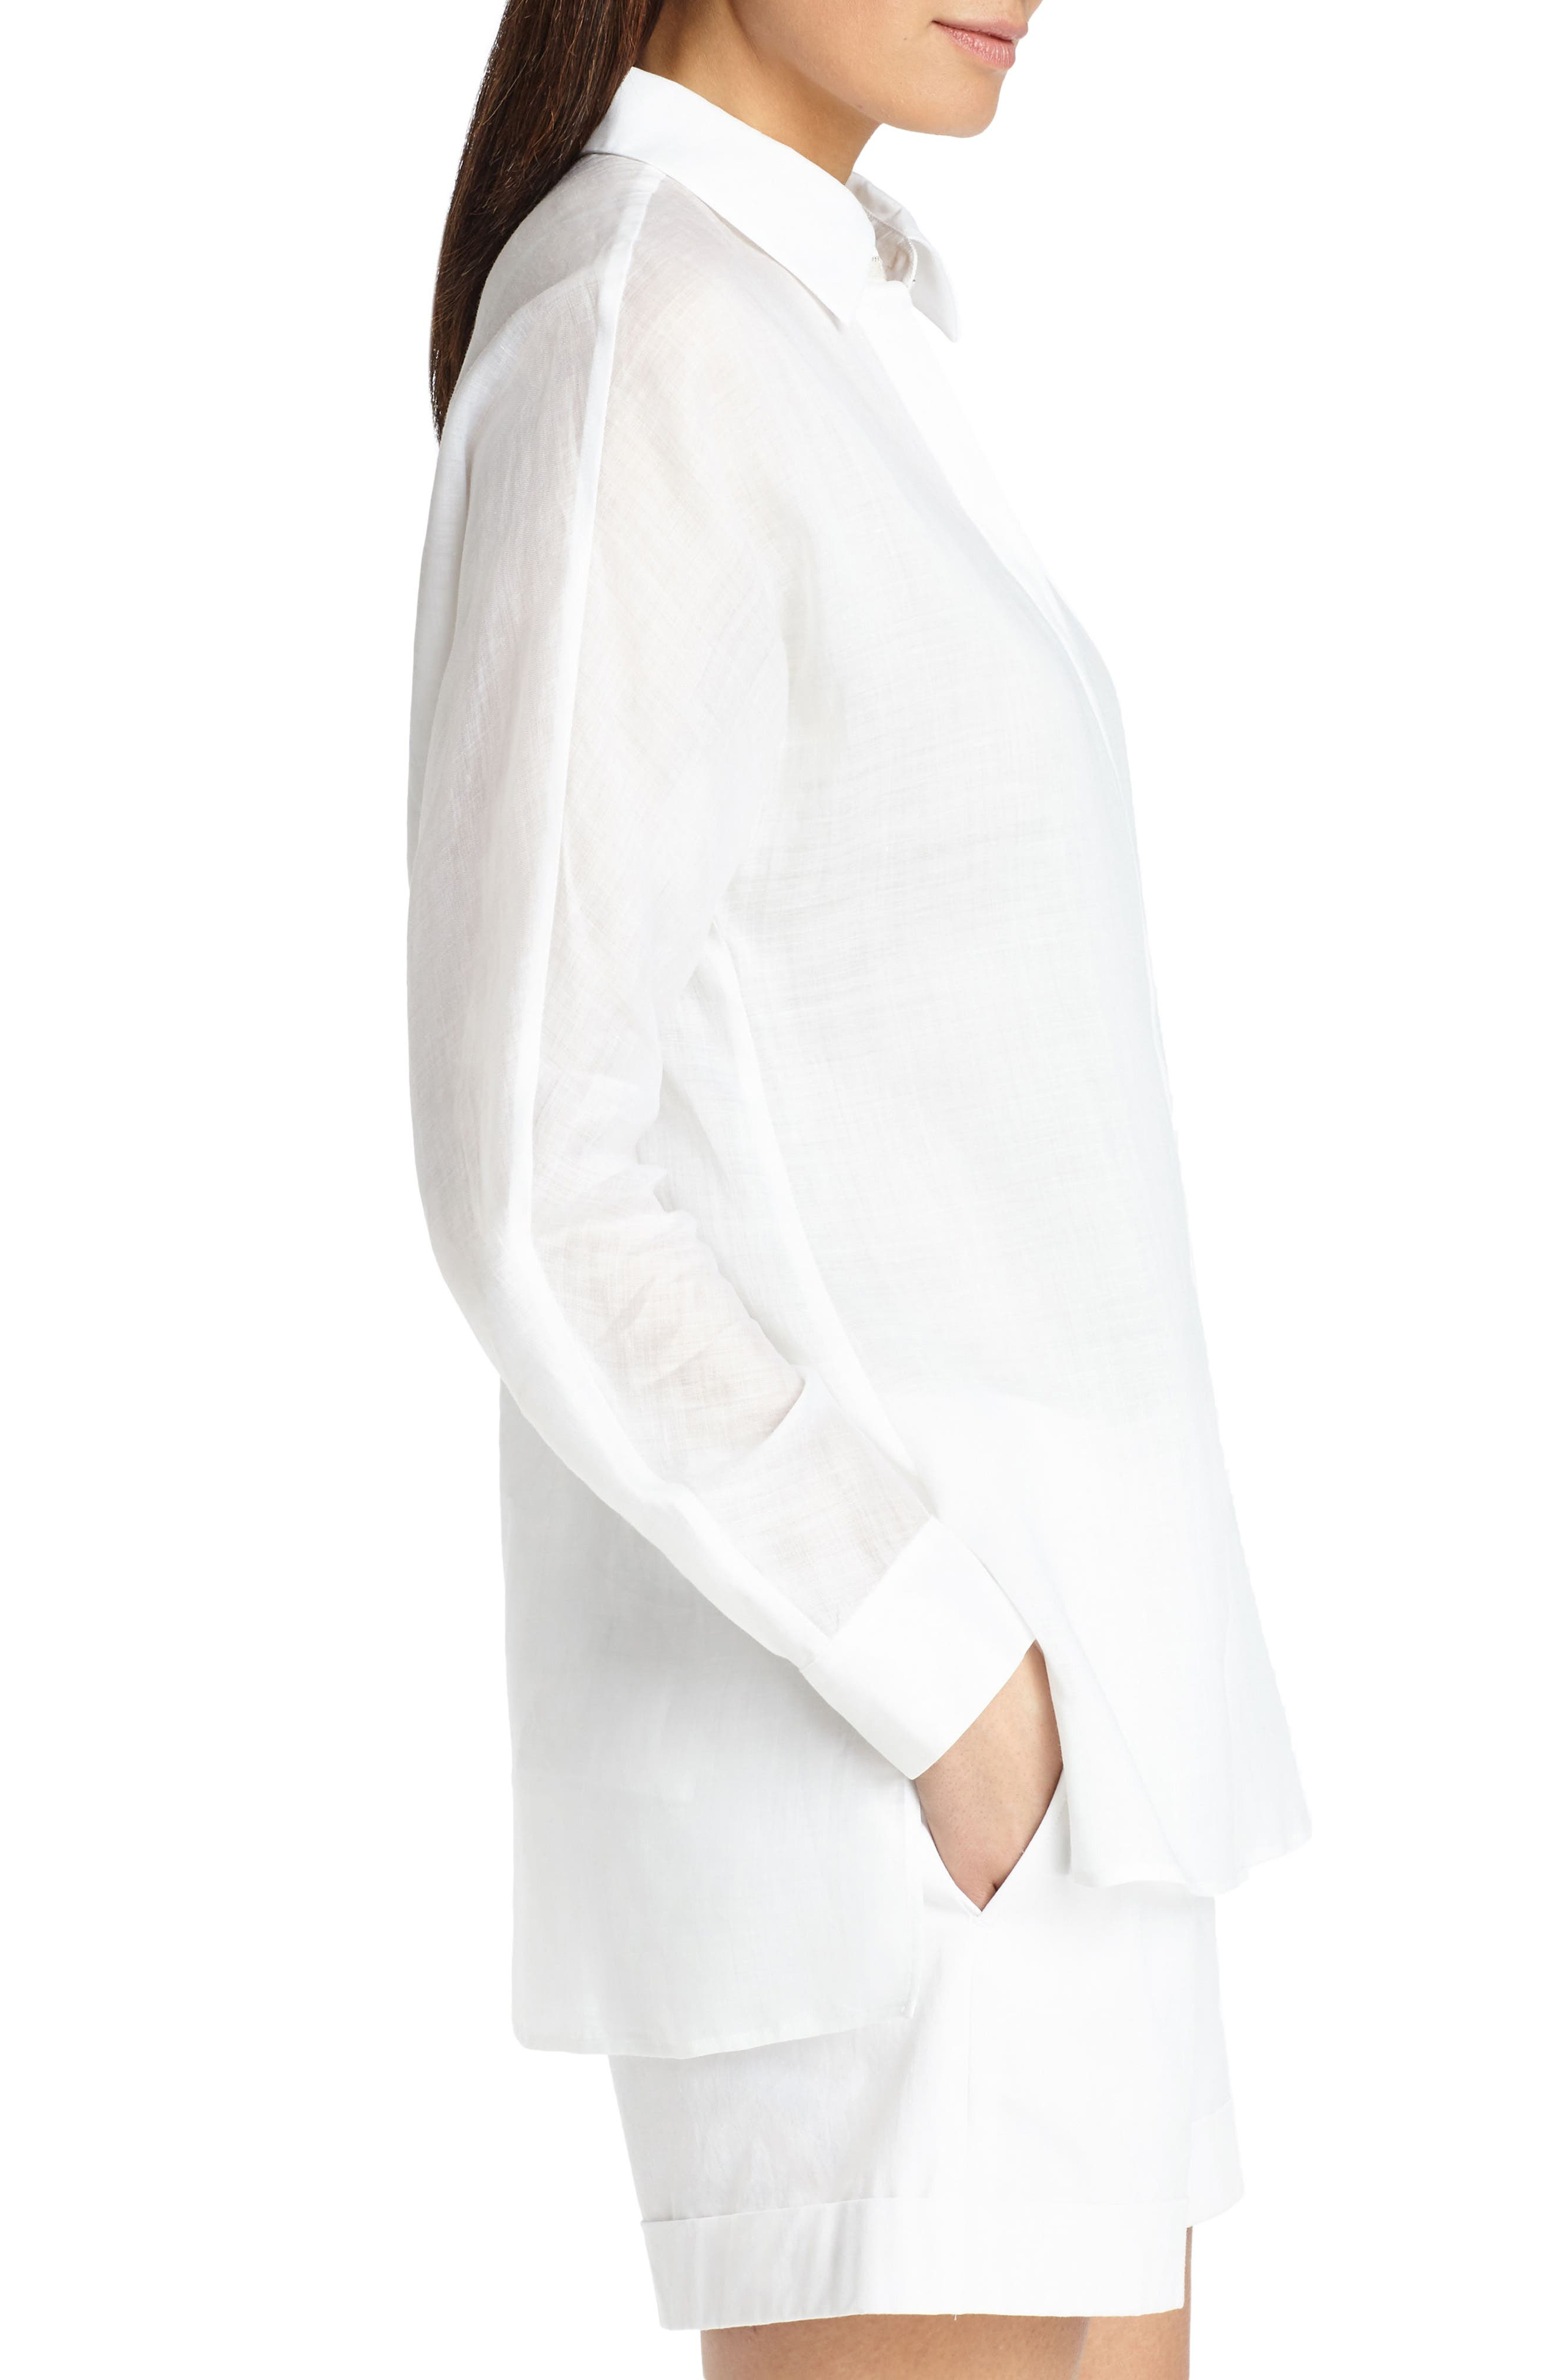 Alyssa Gemma Cloth Blouse,                             Alternate thumbnail 3, color,                             White